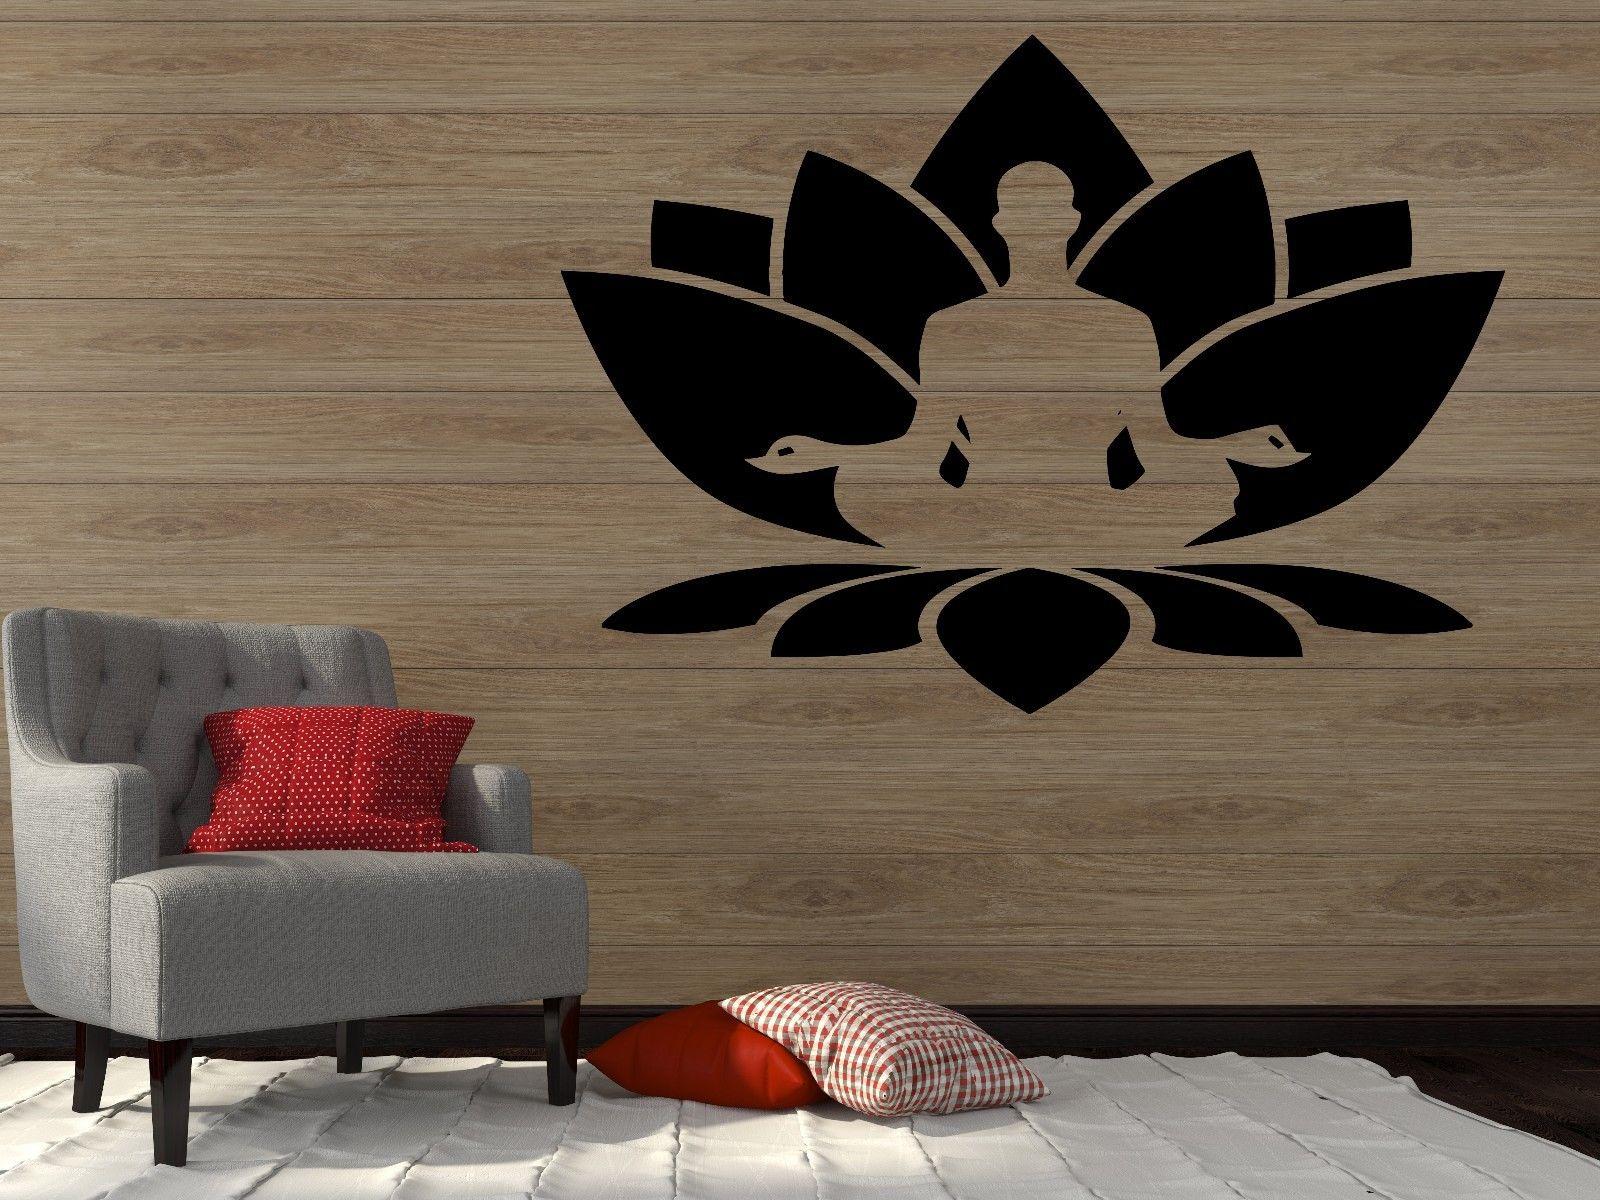 Yoga Wall Vinyl Sticker Decal Lotus Flower Seated Buddha Meditation Yoga Studio Sticker